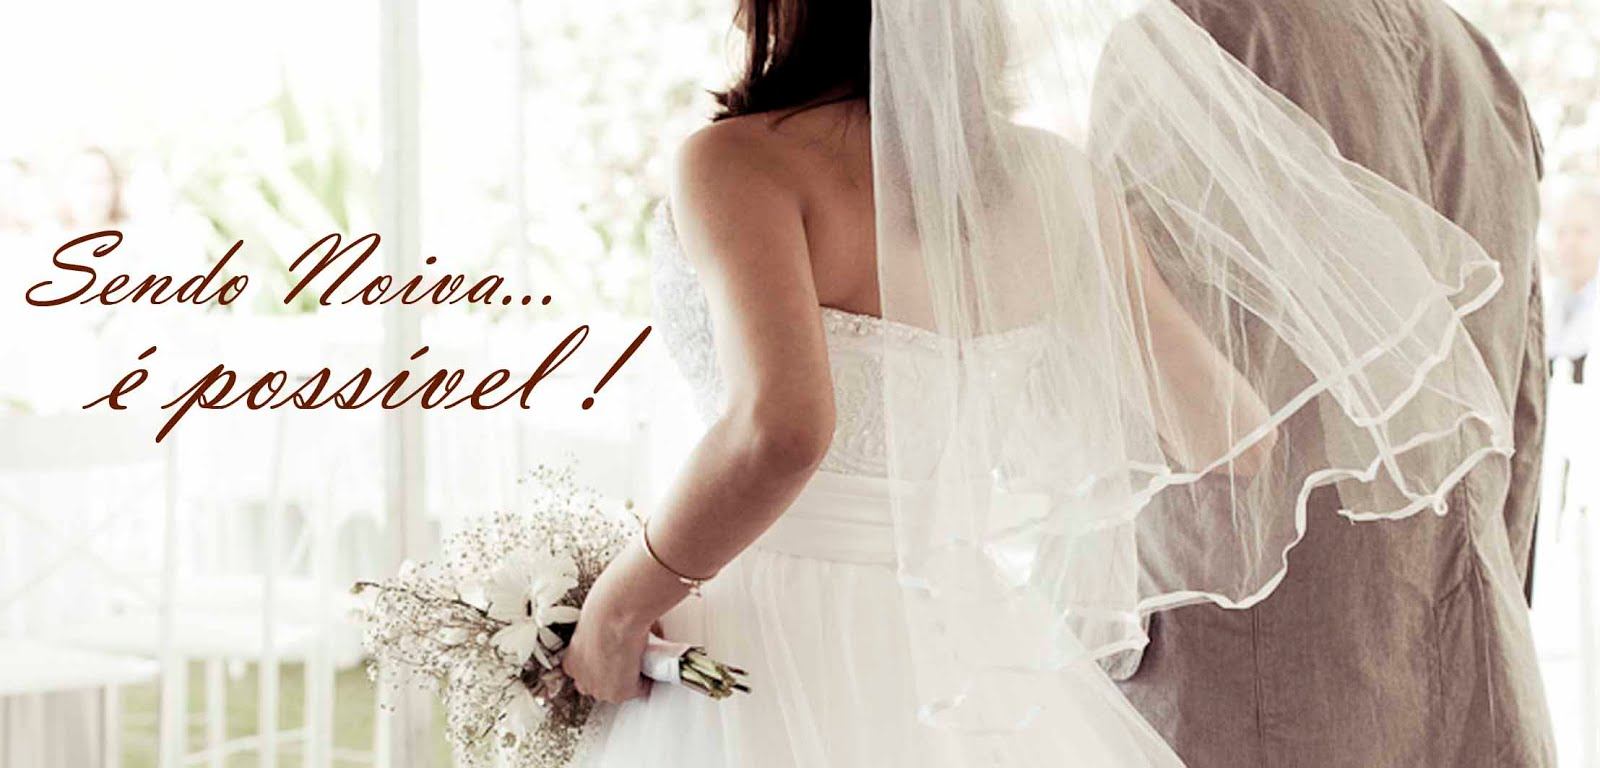 Sendo noiva é possível